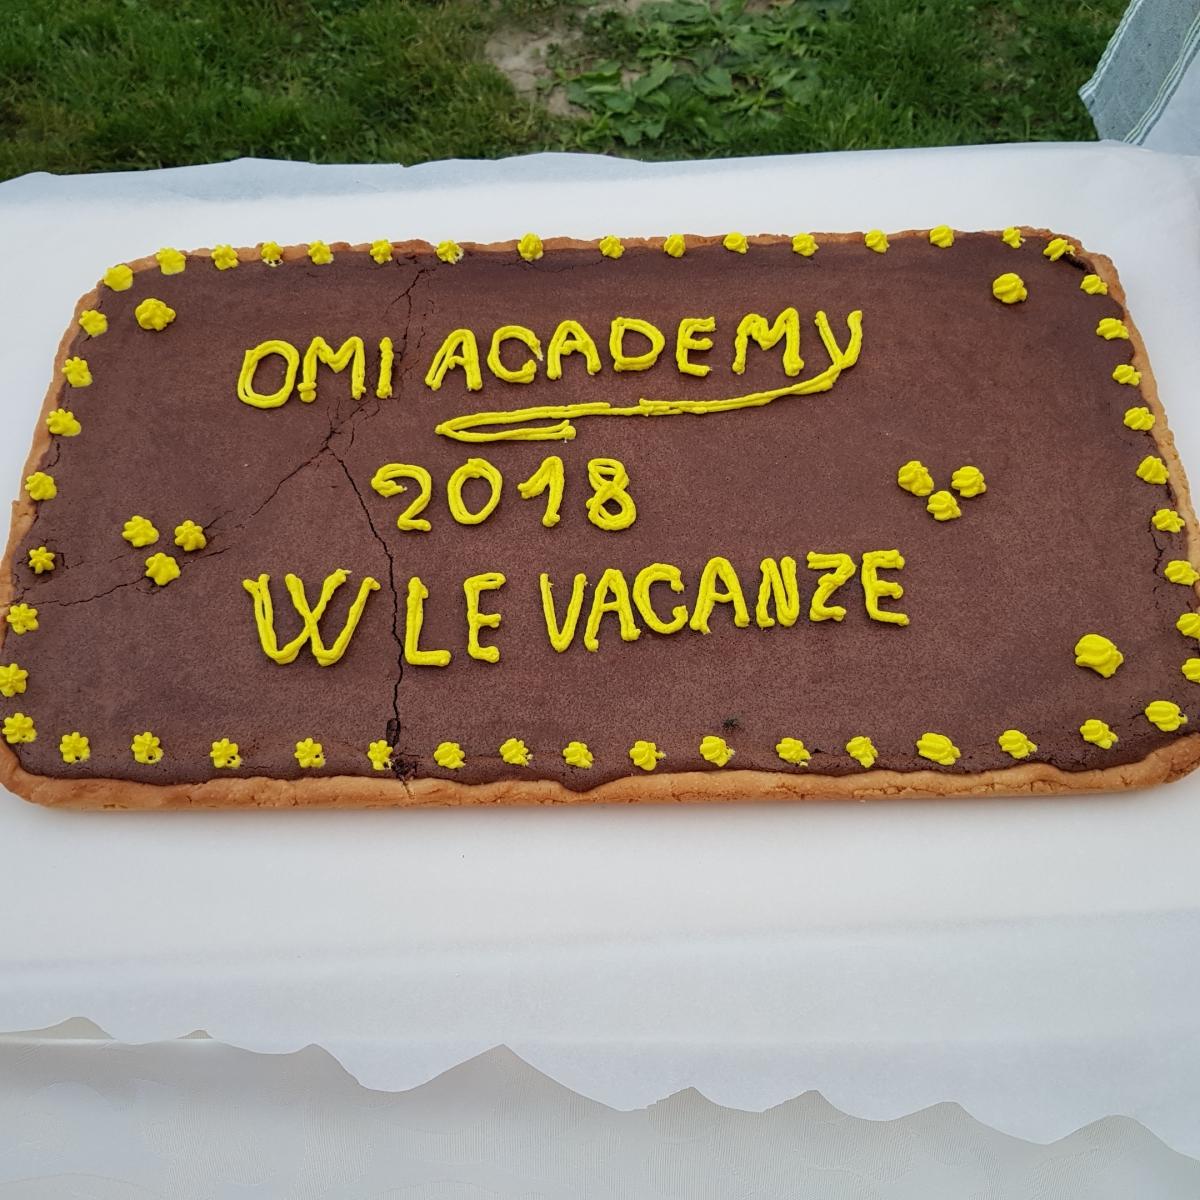 Rinfresco OMI Academy 2018 (23)